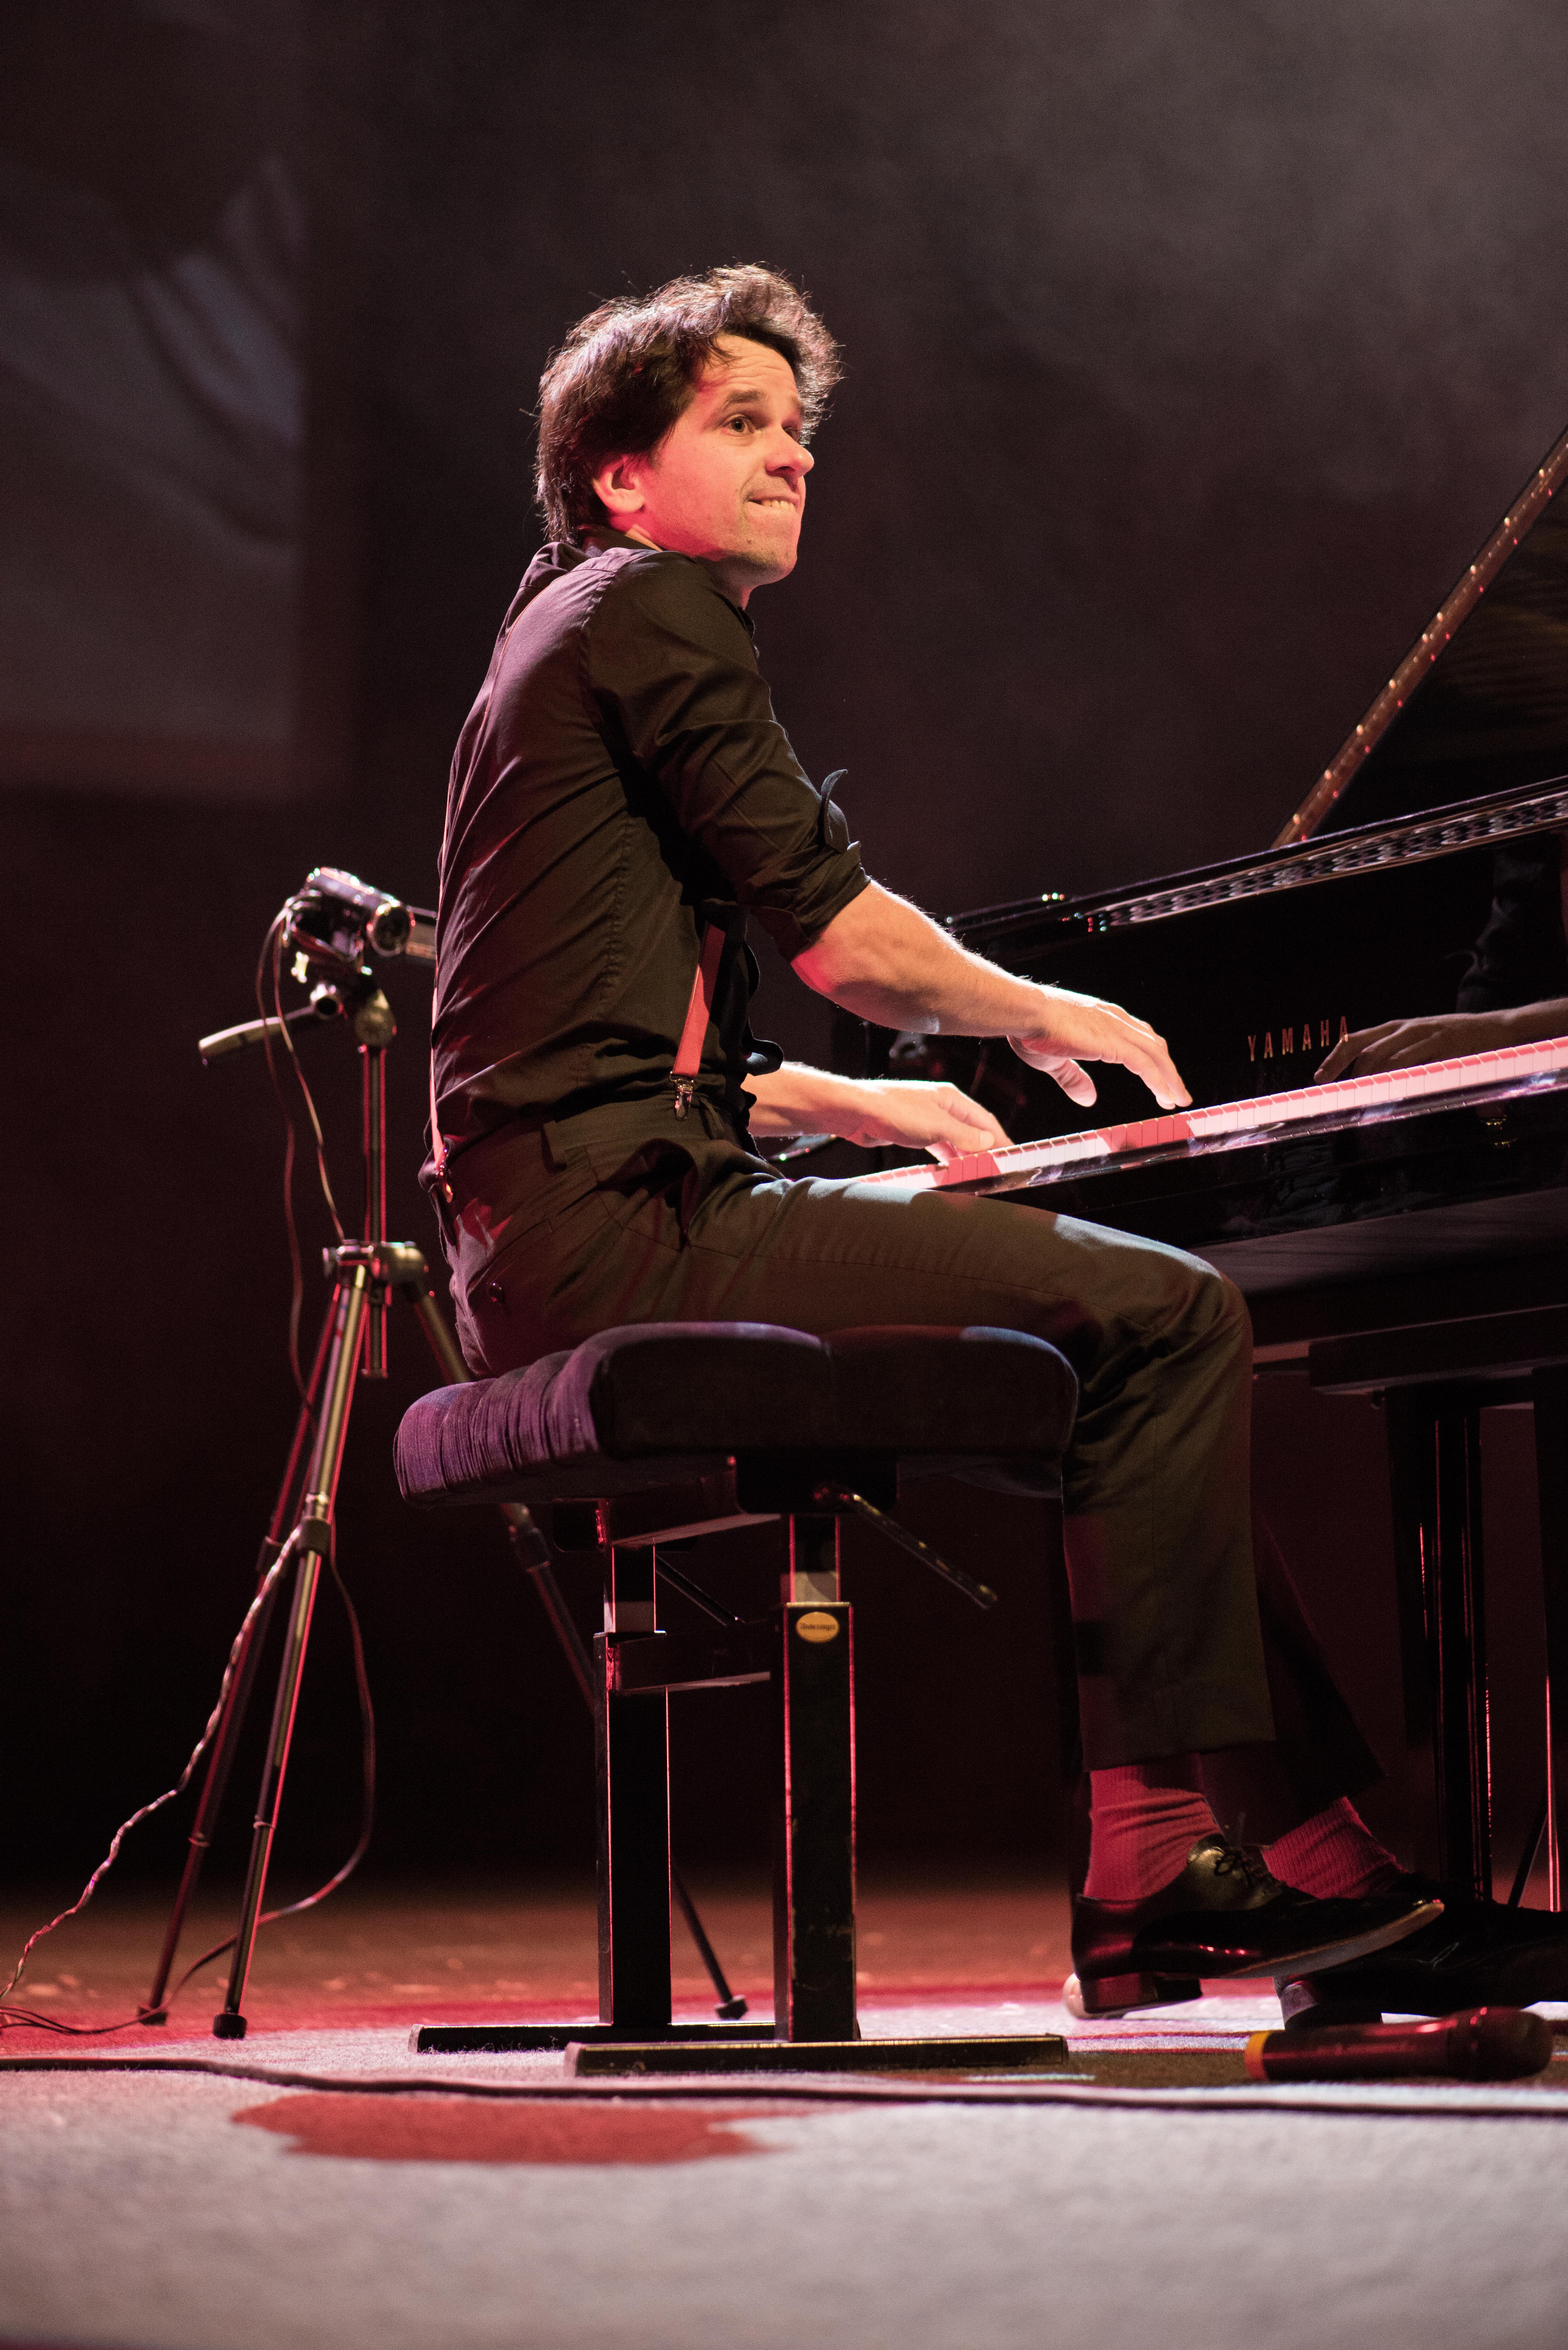 Pierre-Yves Plat, pianiste en concert